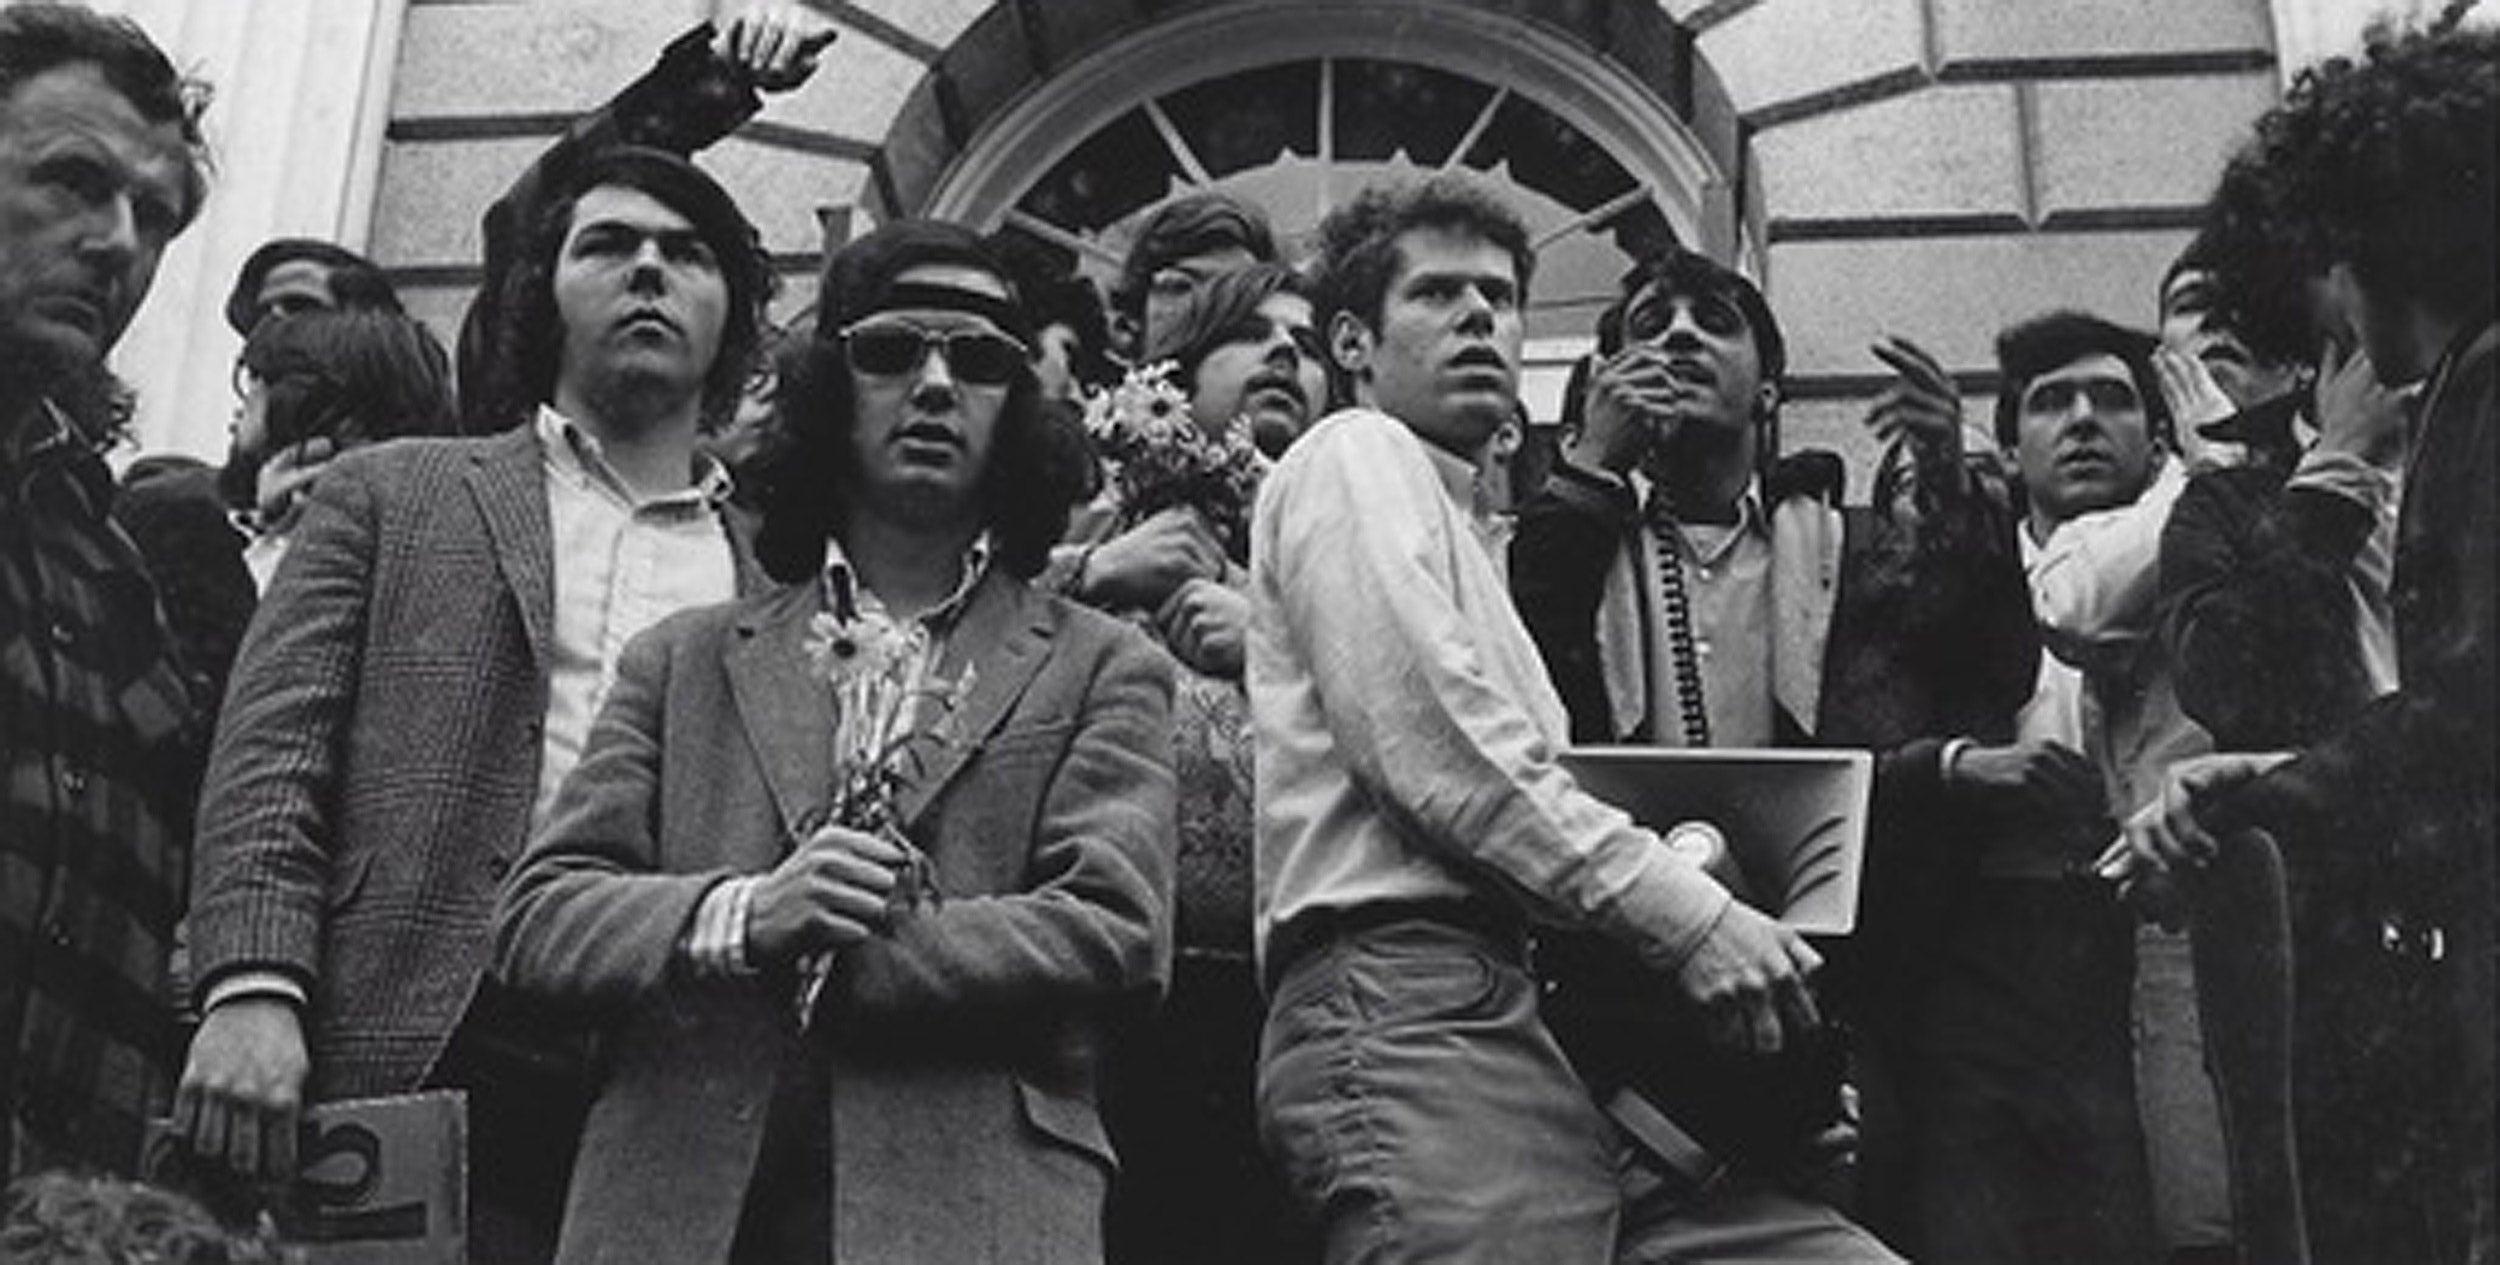 Nate Goldshlag in 1969 holding bullhorn amid protesters.